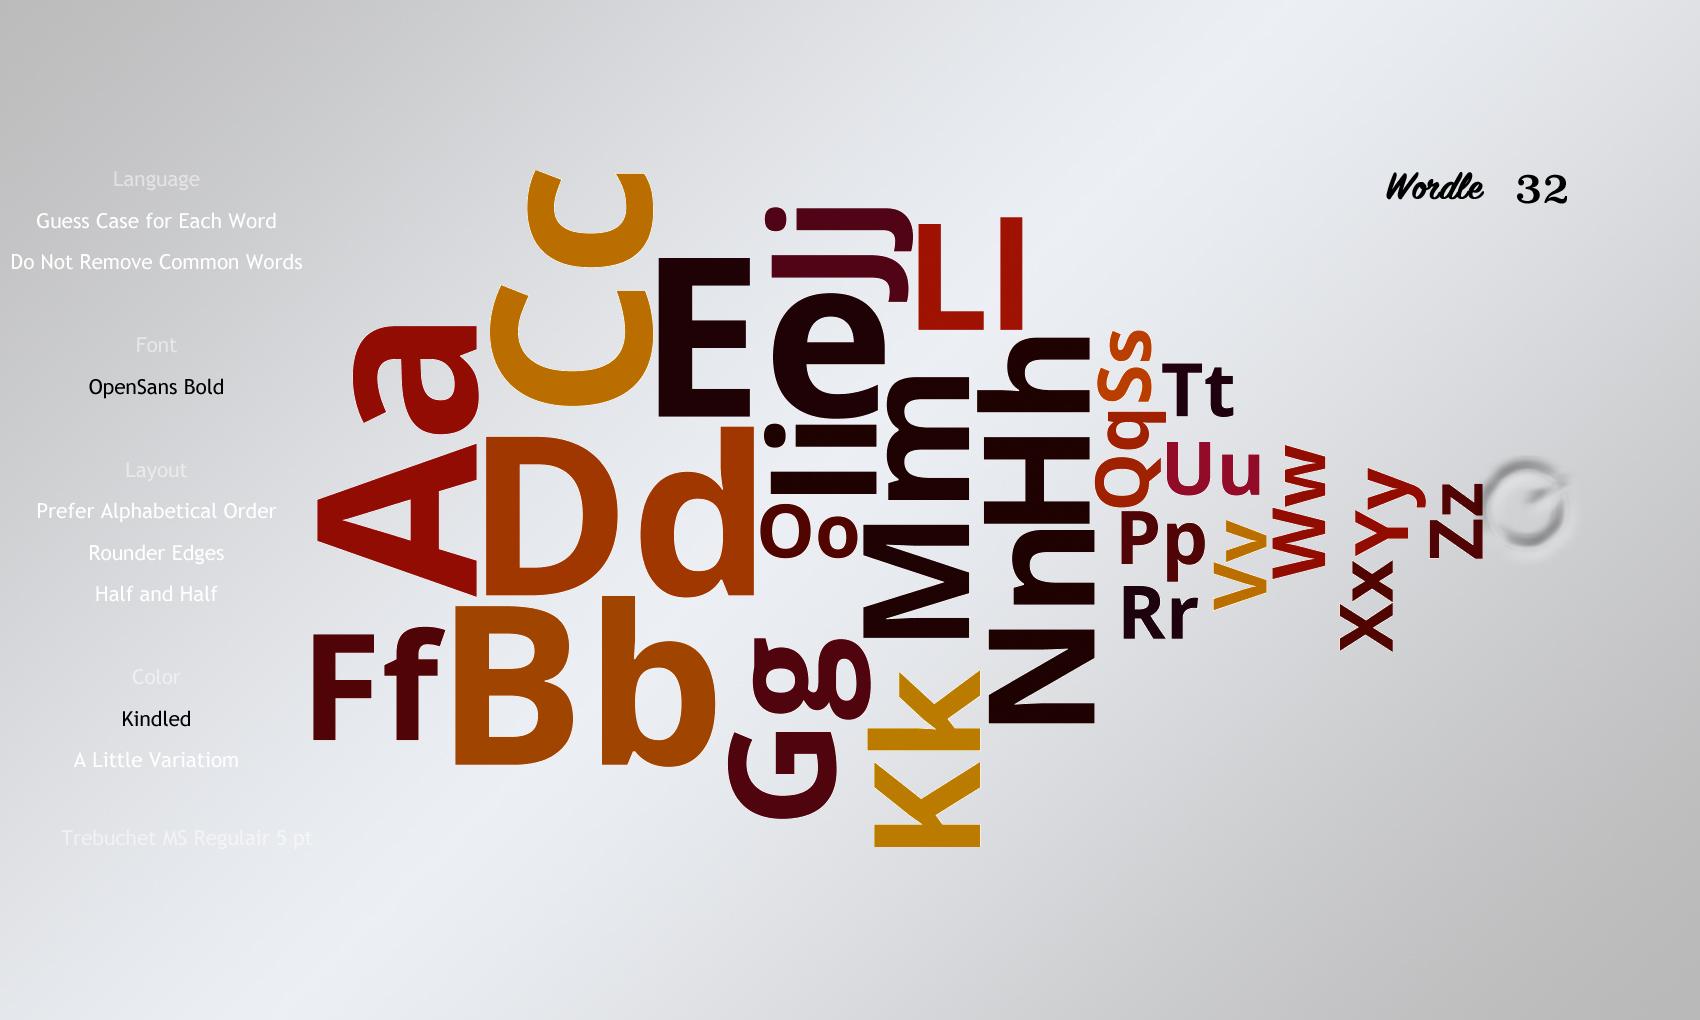 Wordle 32 OpenSans Bold